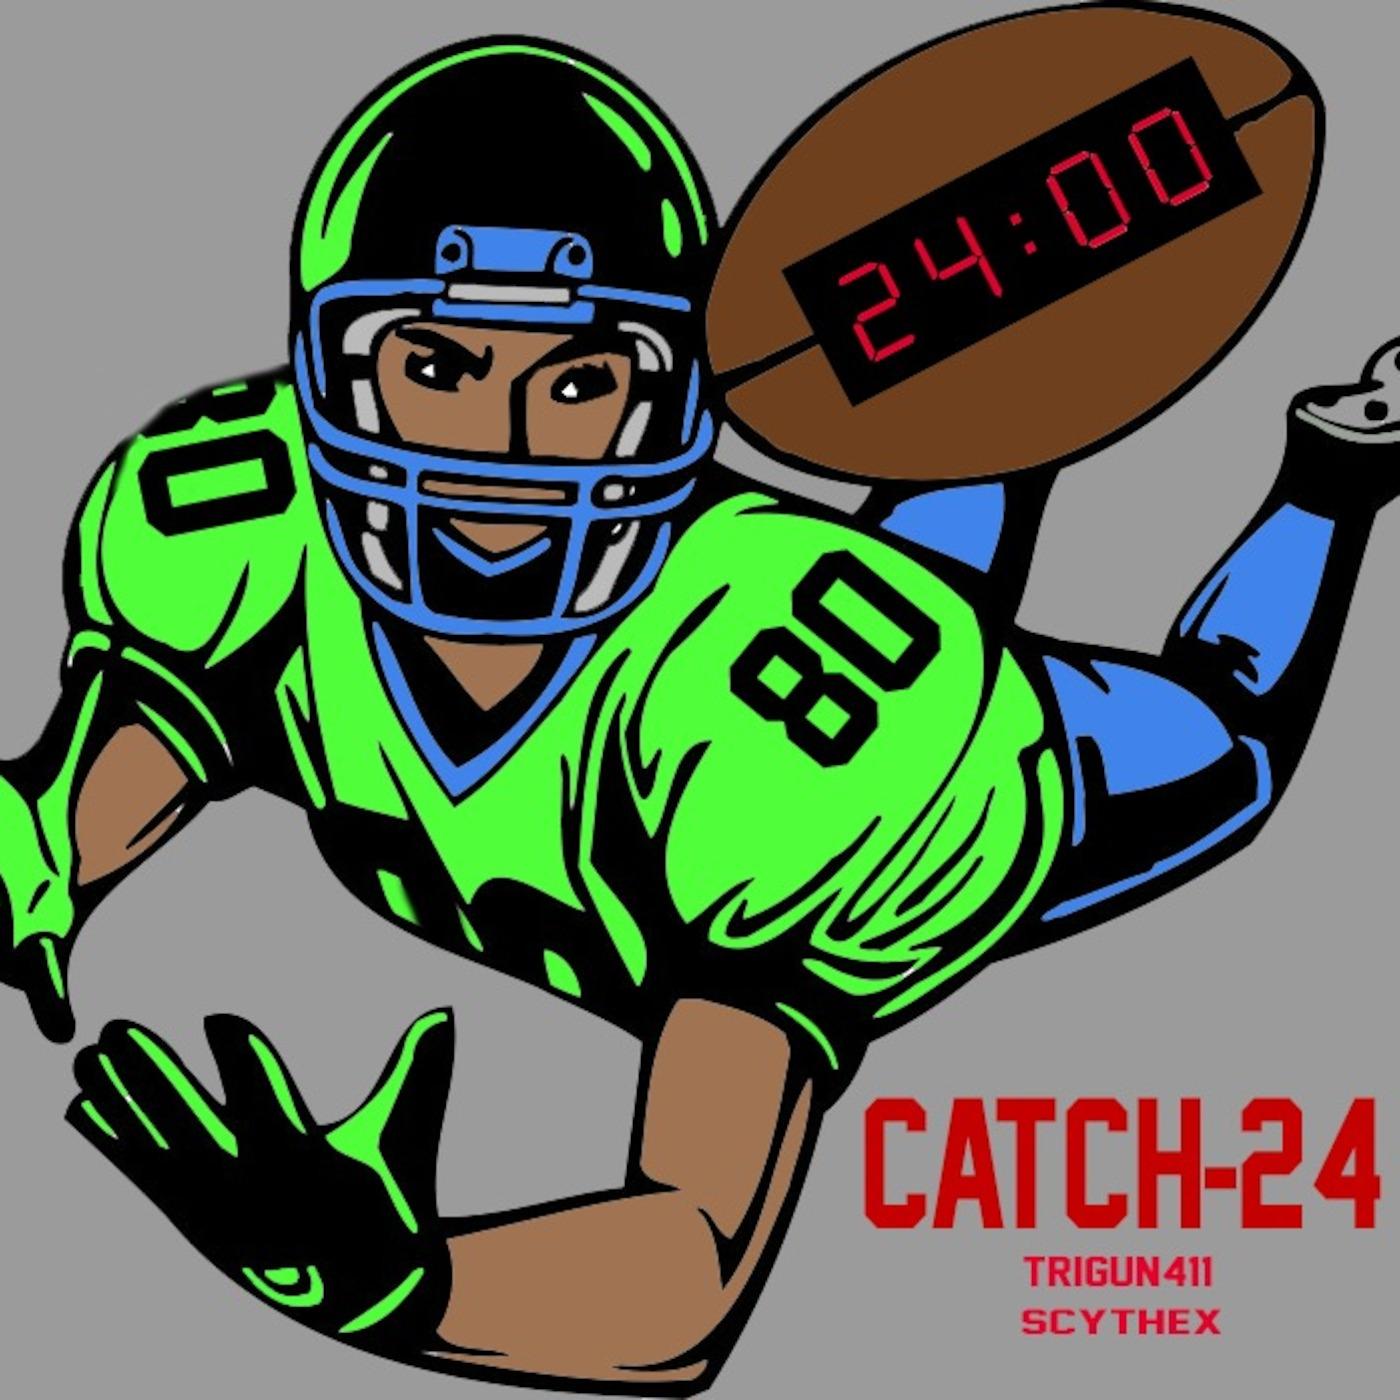 Catch-24 Episode 3!